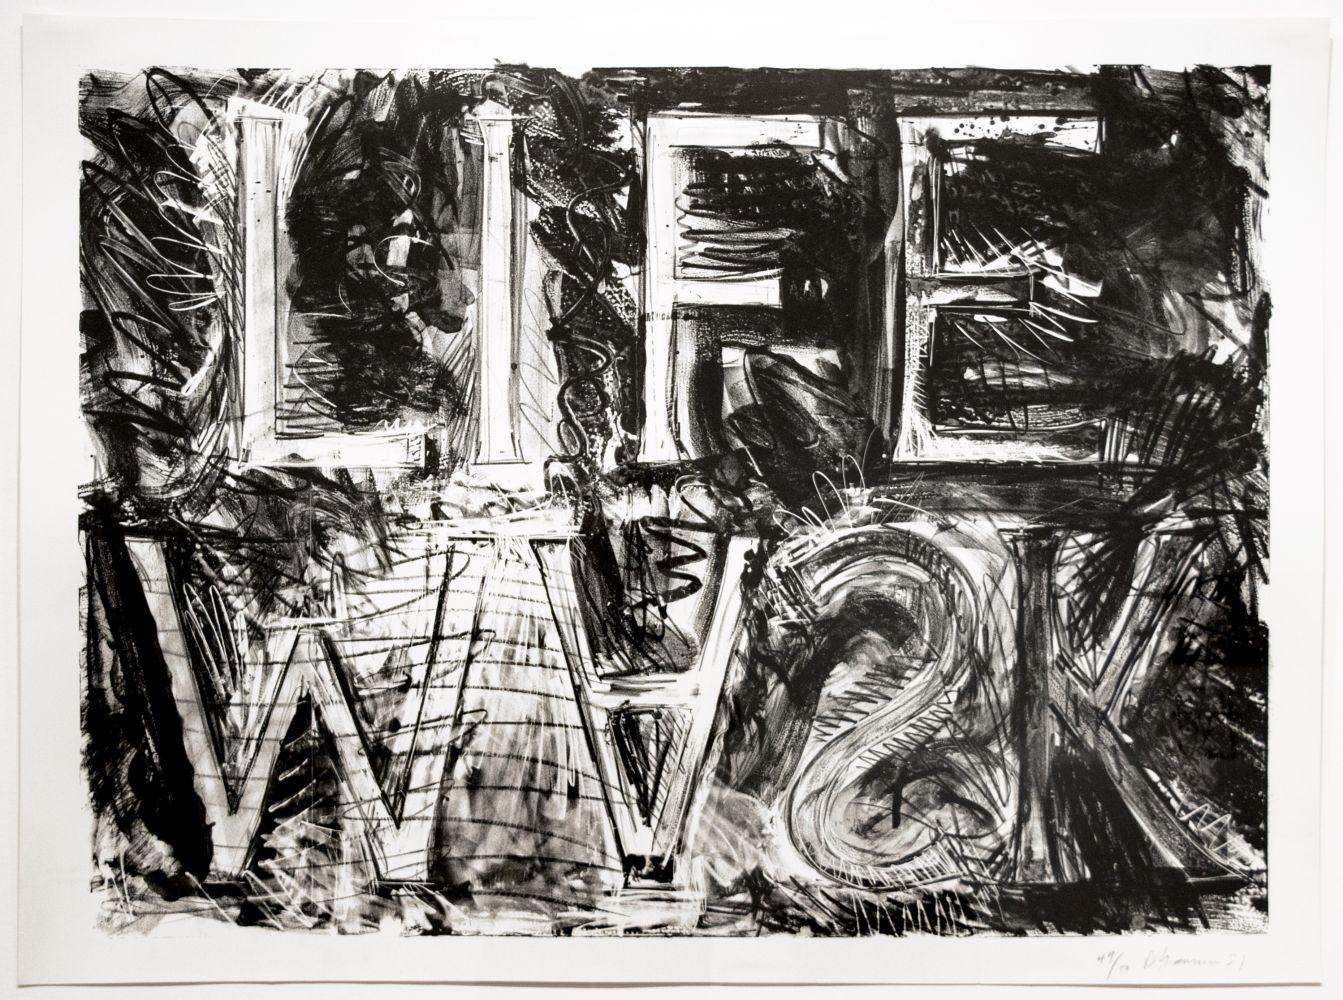 Bruce Nauman: Life Mask, 1981